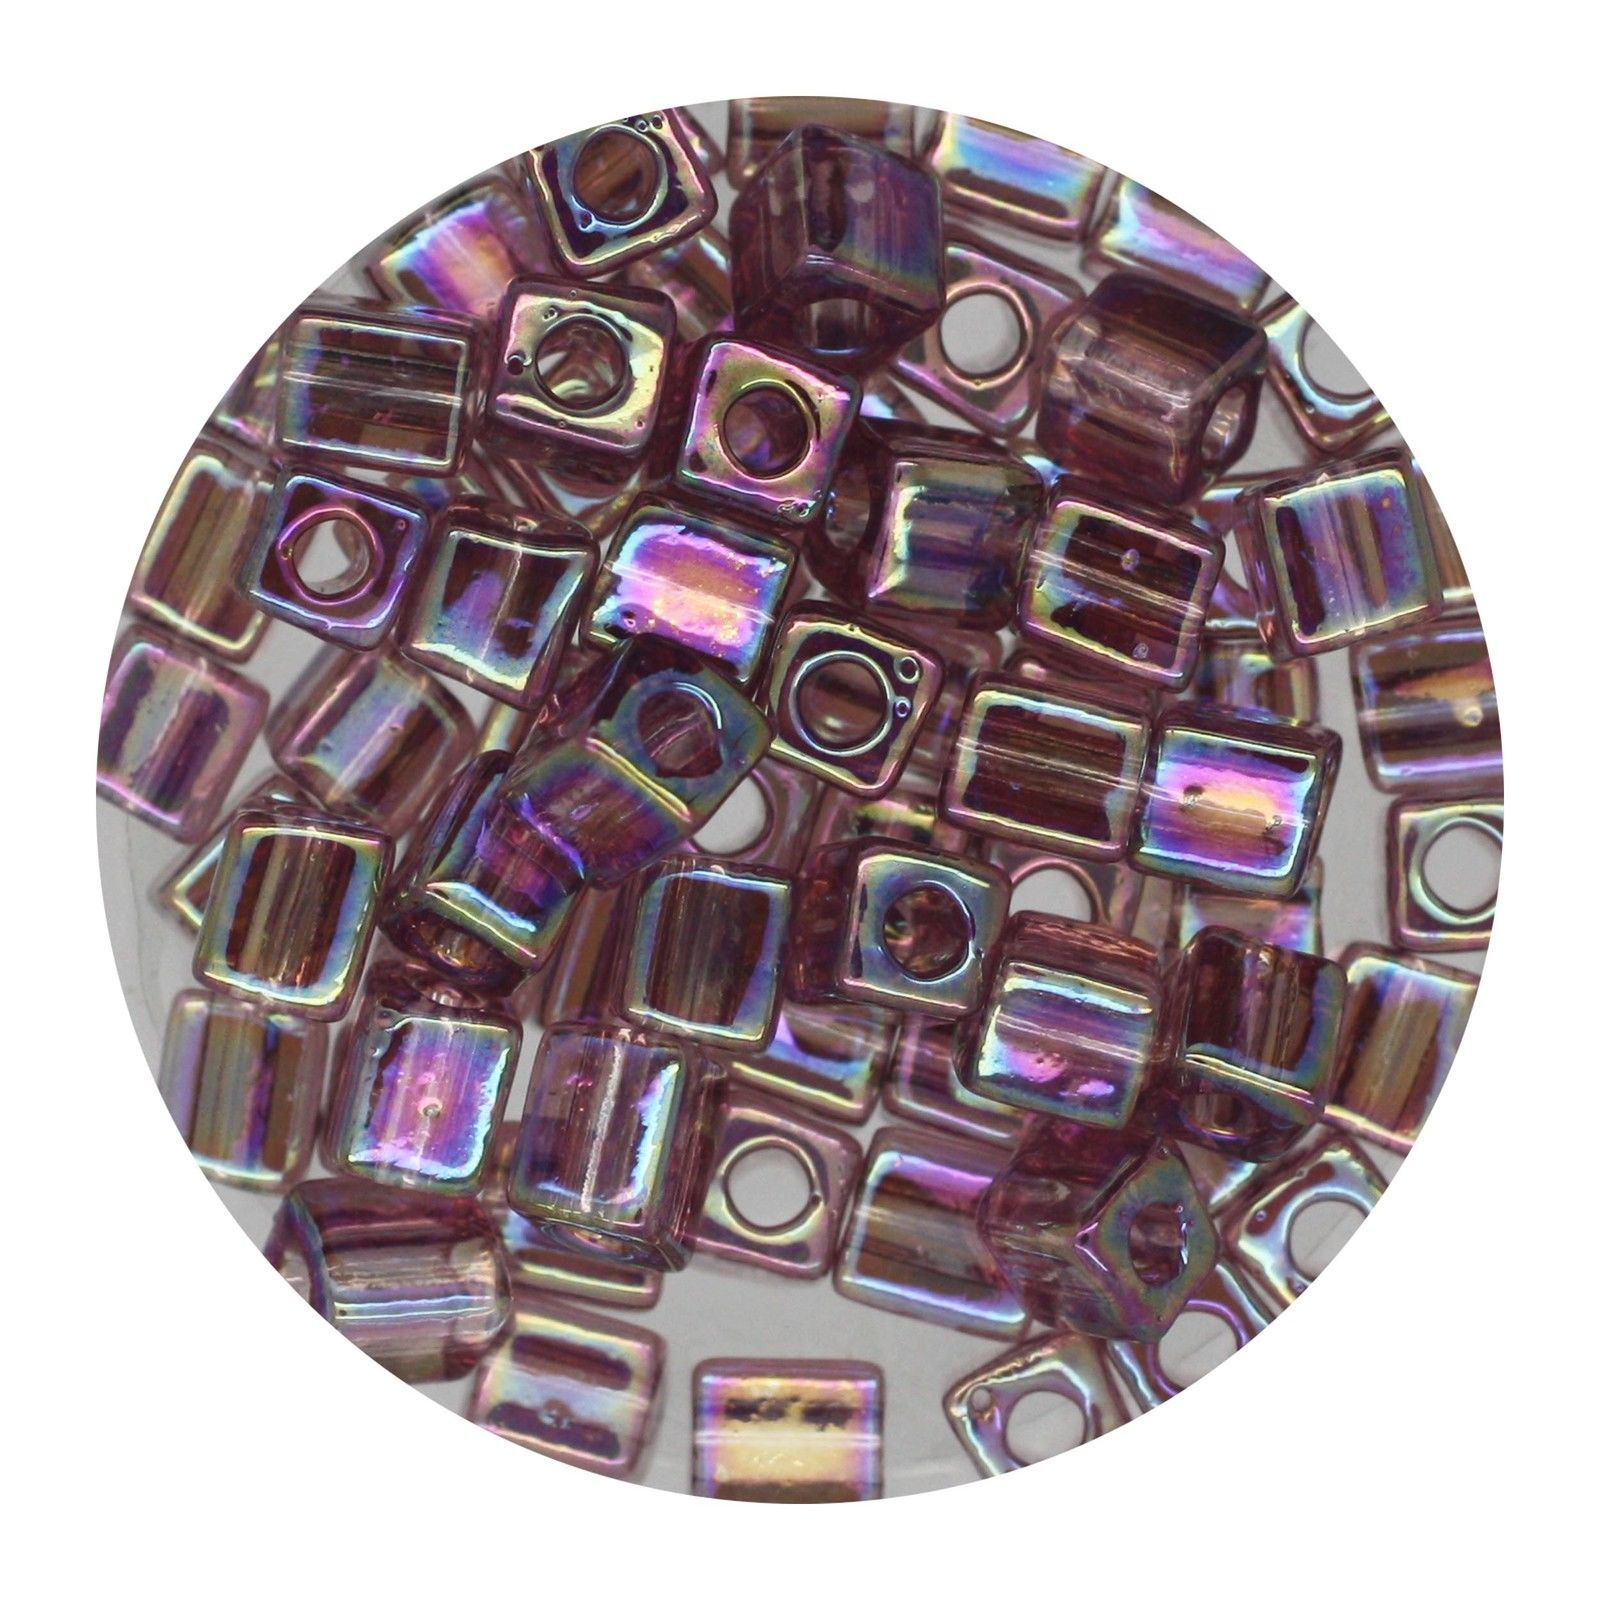 Square Glass Beads Japan 4mm Miyuki Cube Transparent Light Amethyst Ab - $6.94